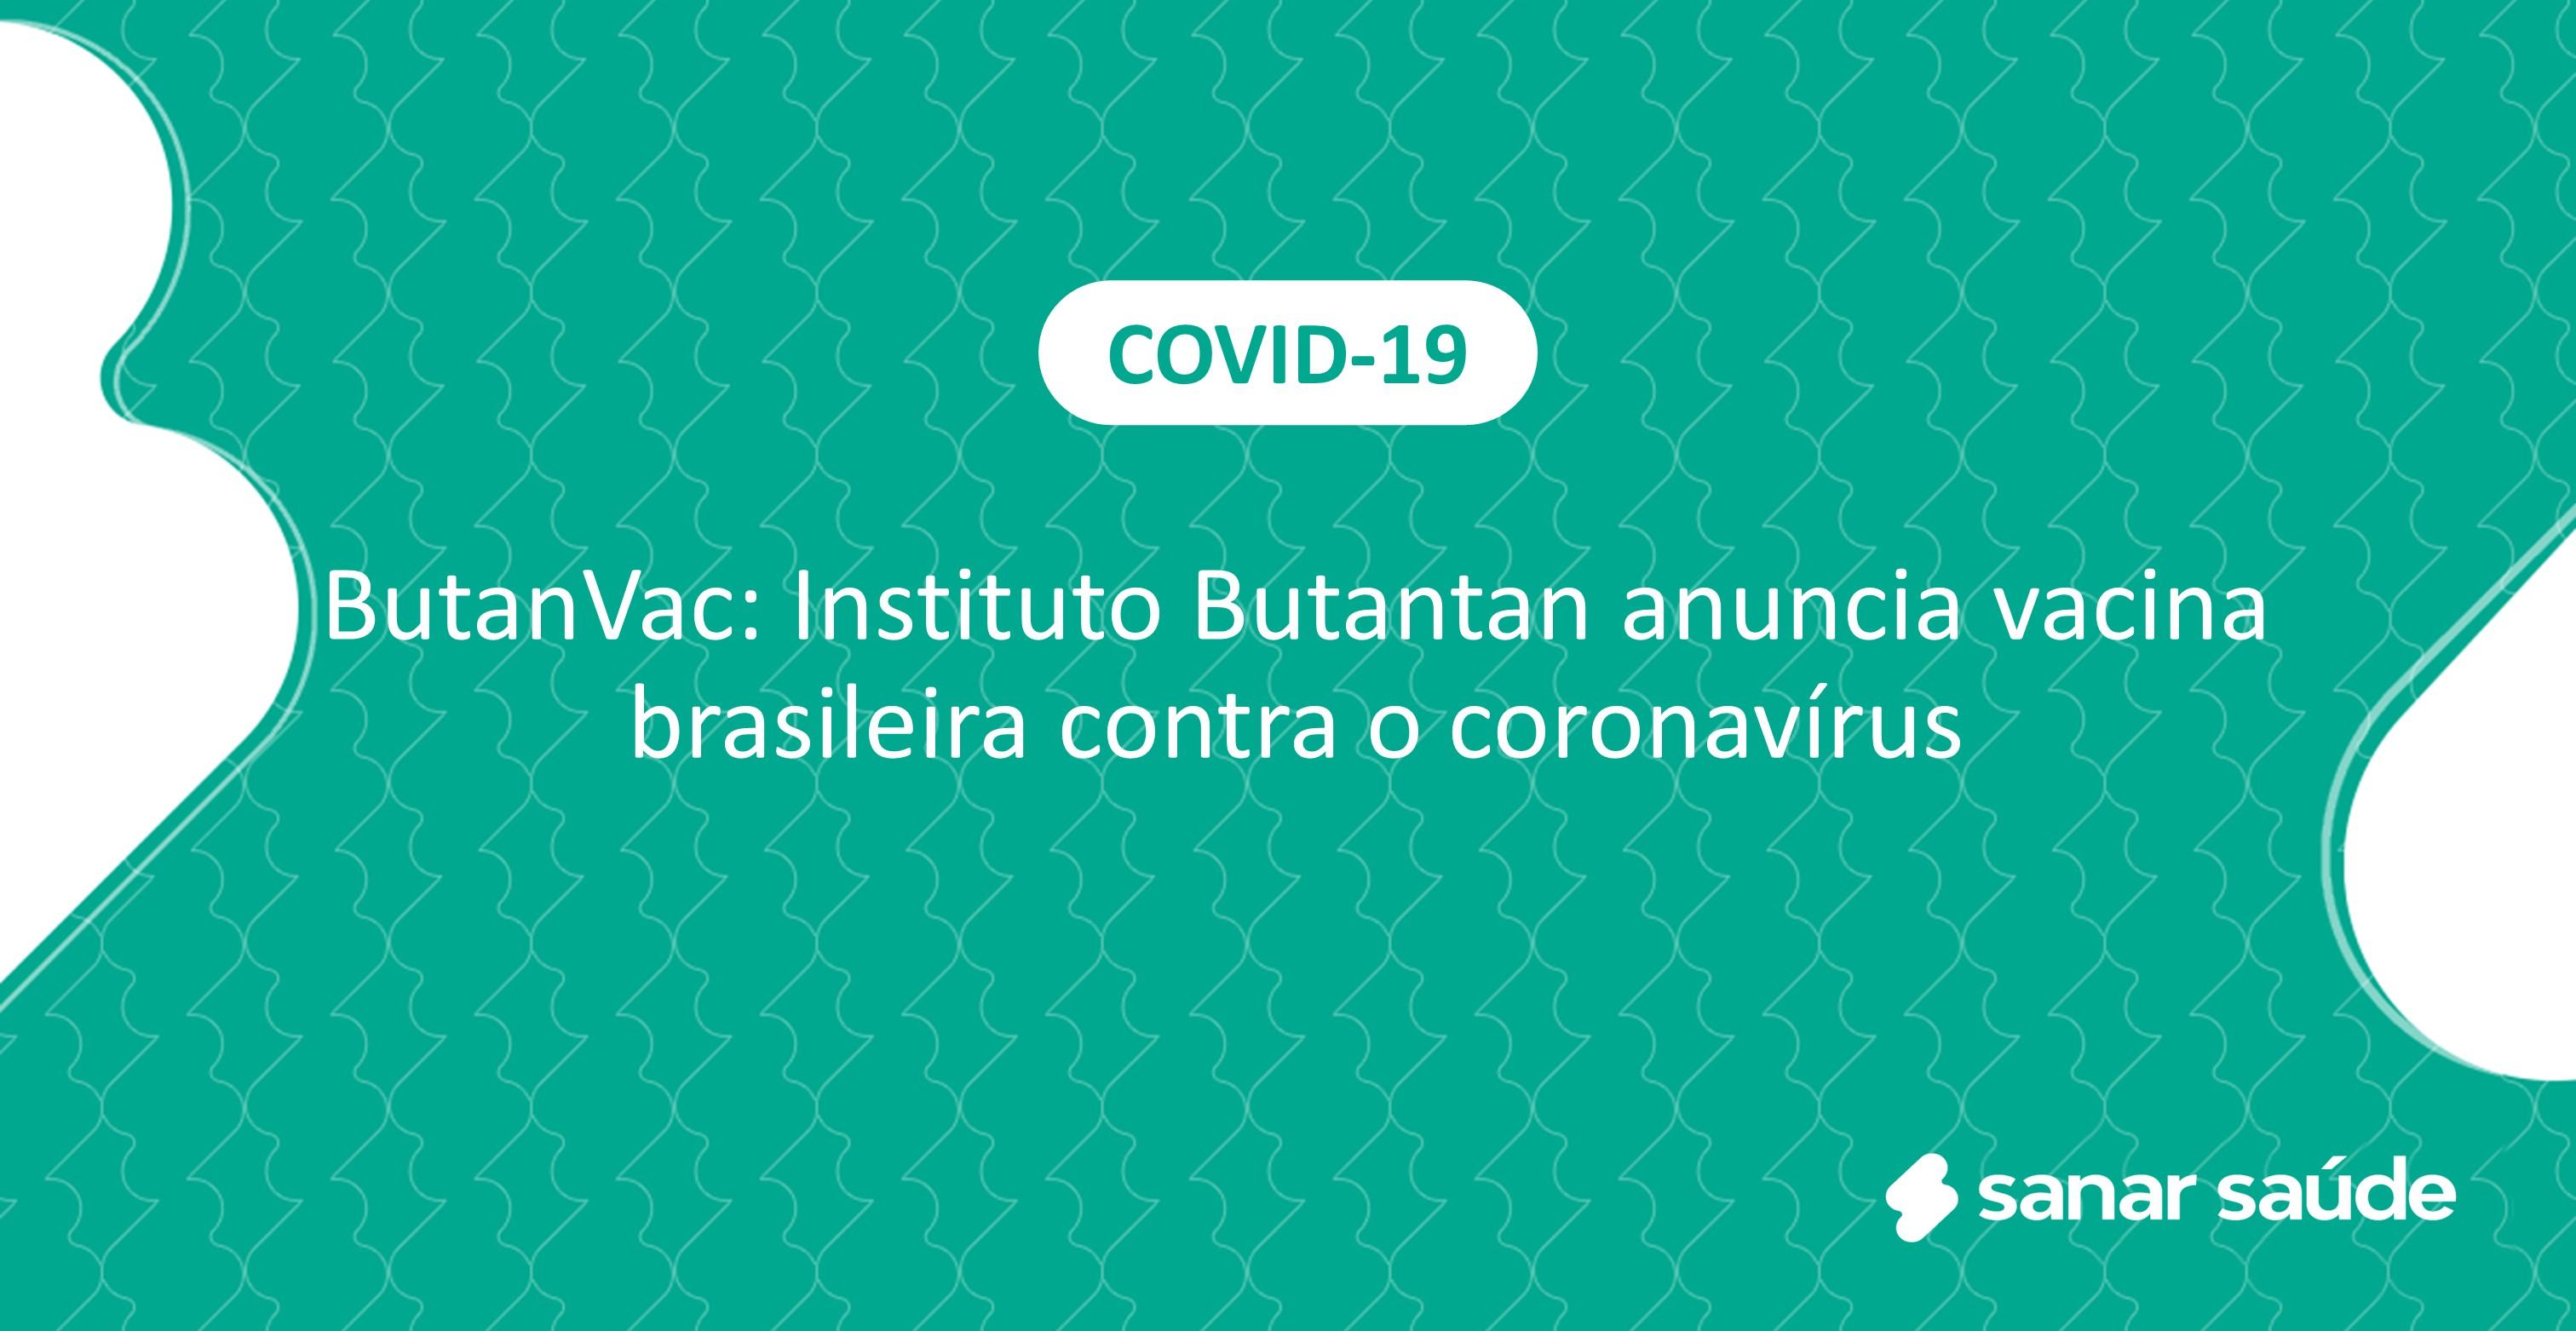 a-butanvac.jpg (417 KB)